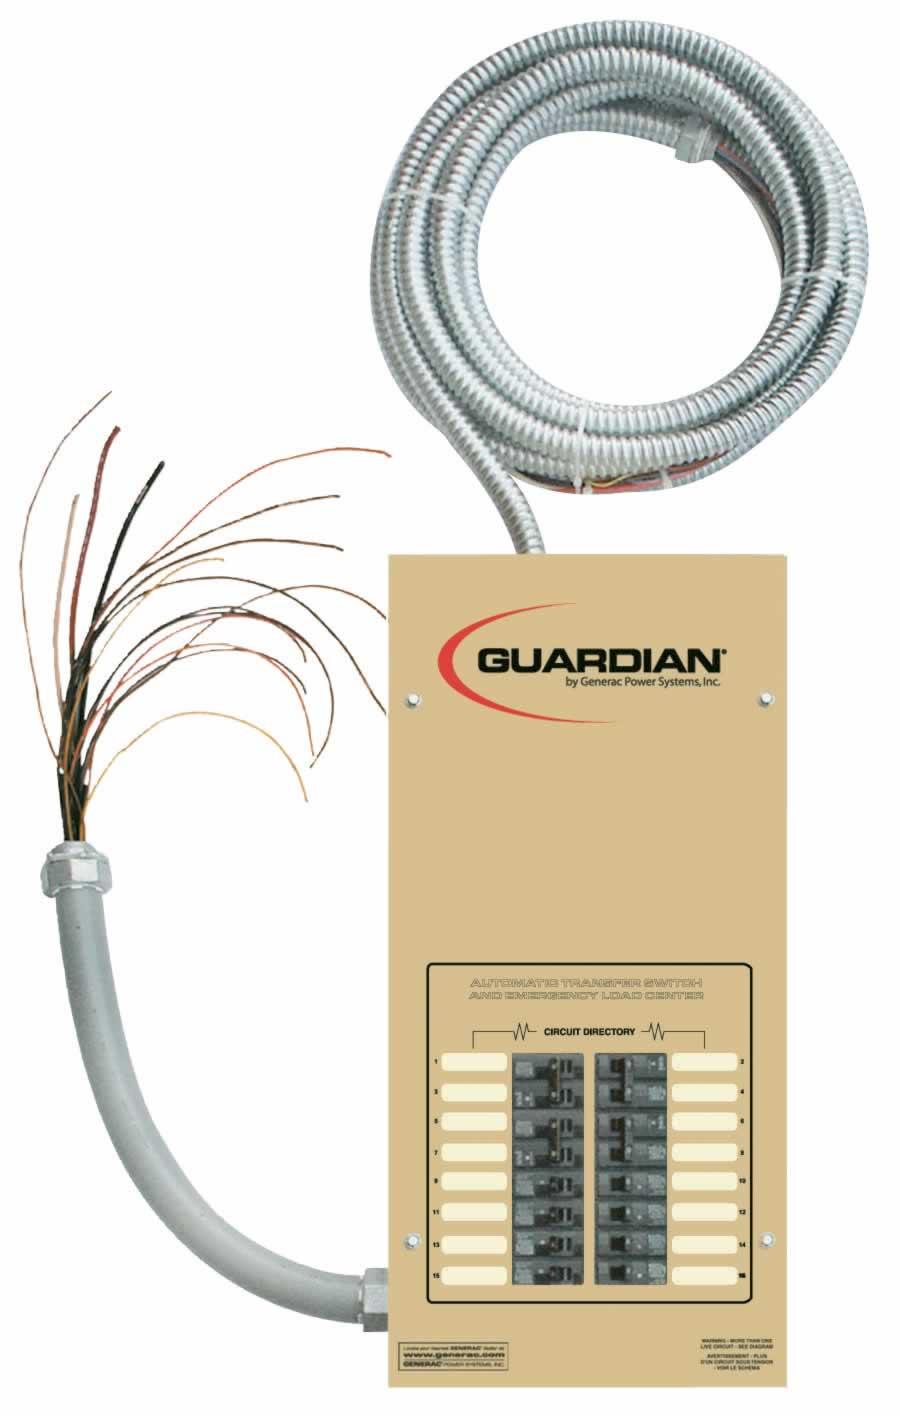 generac whole house generator wiring diagram 2006 volkswagen jetta fuse box 16kw 16 circuit transfer switch